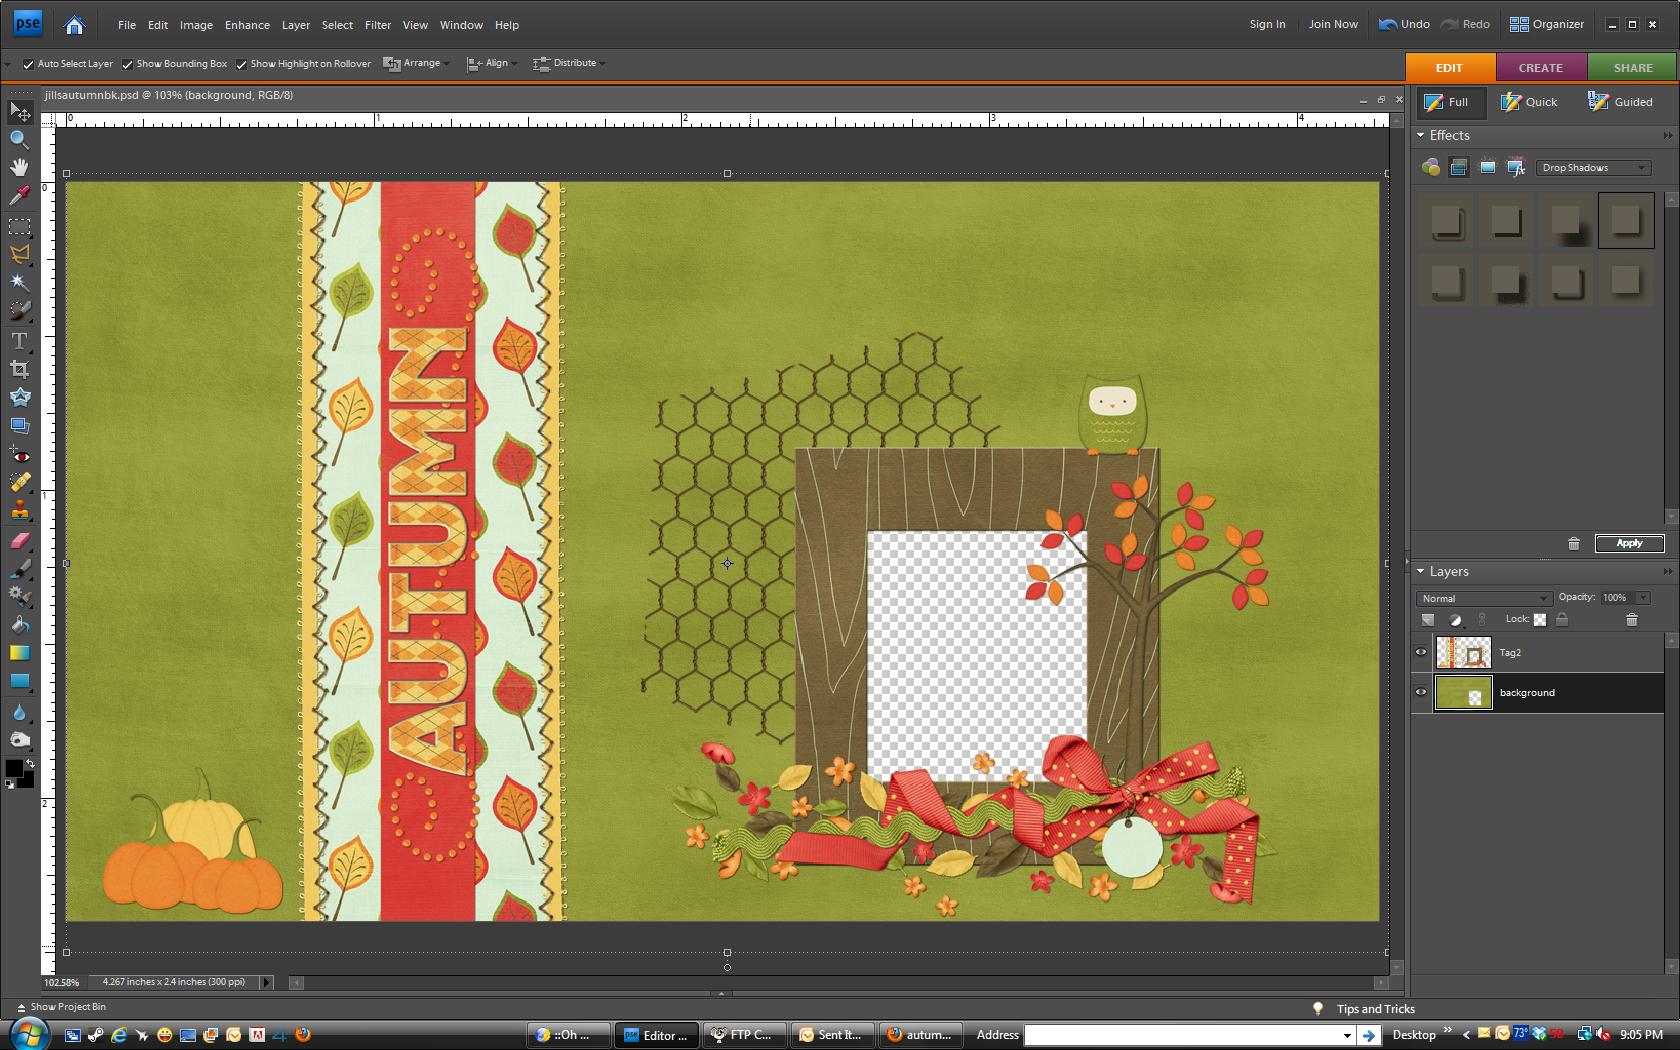 Bushra 3d Wallpaper Computer Wallpaper Free Download Make Your Own Computer